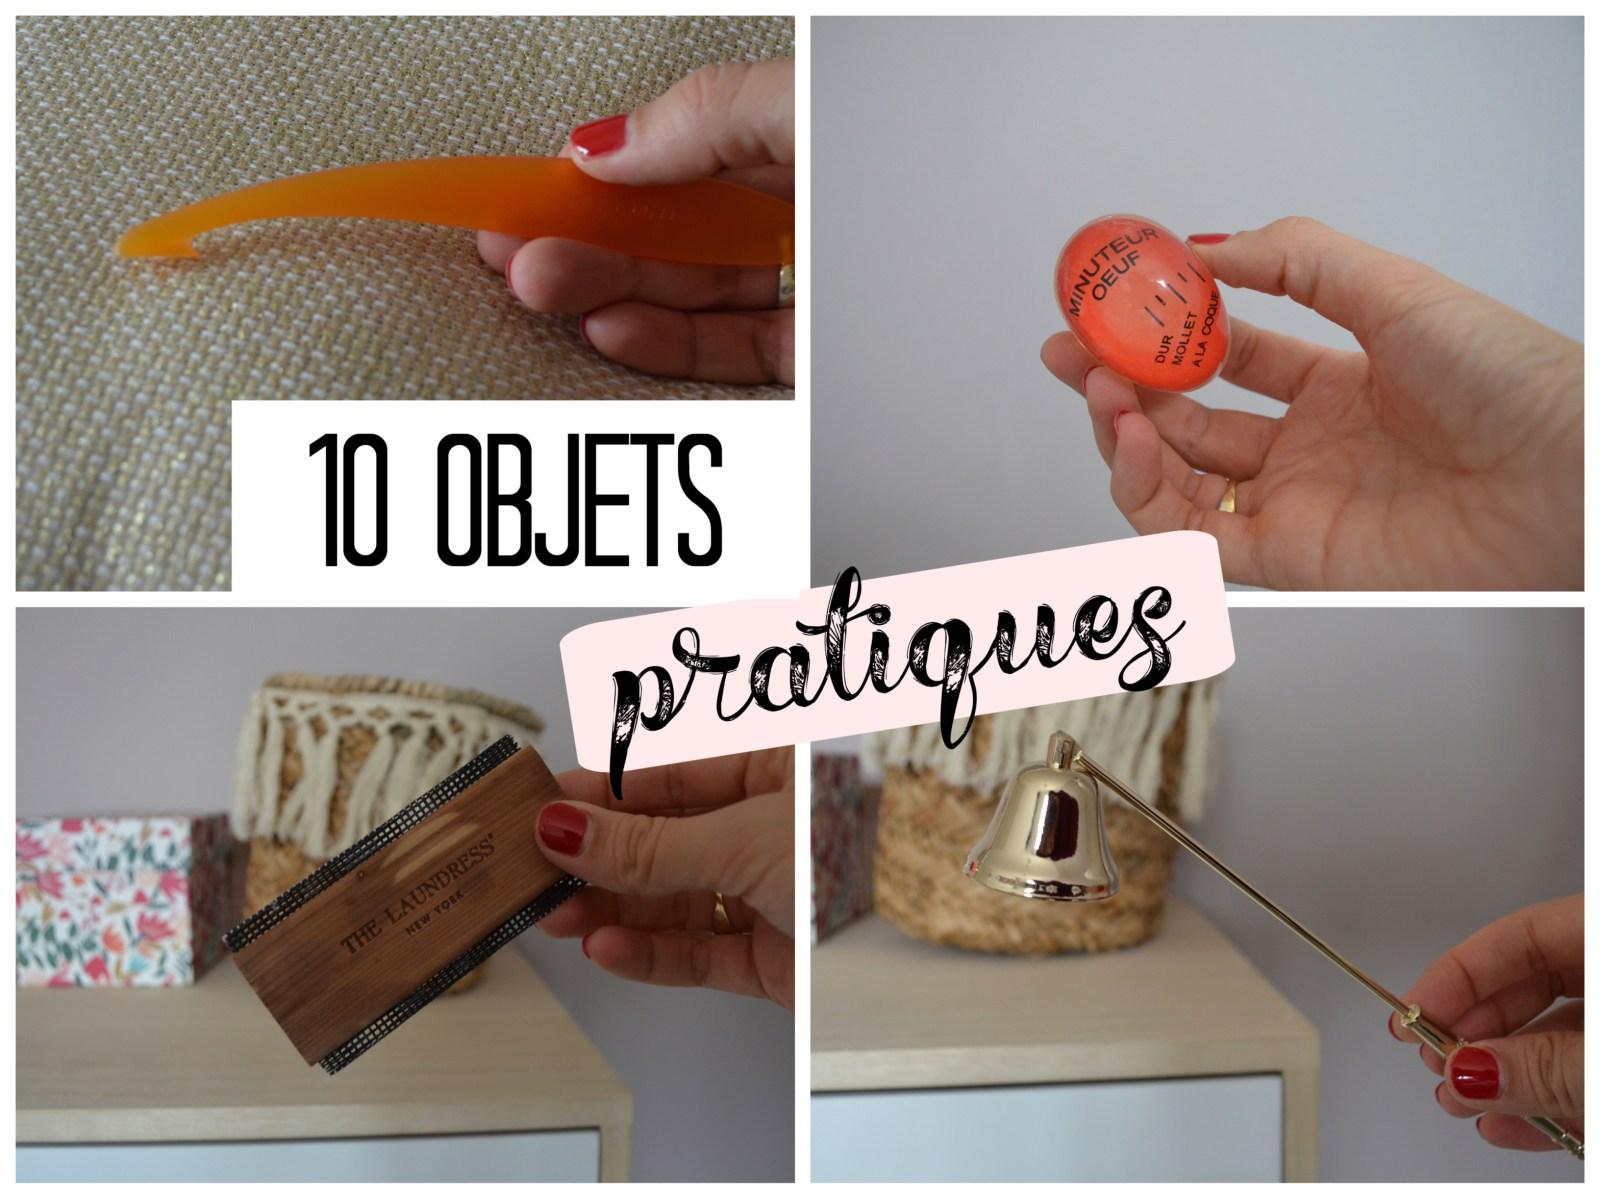 objets pratiques